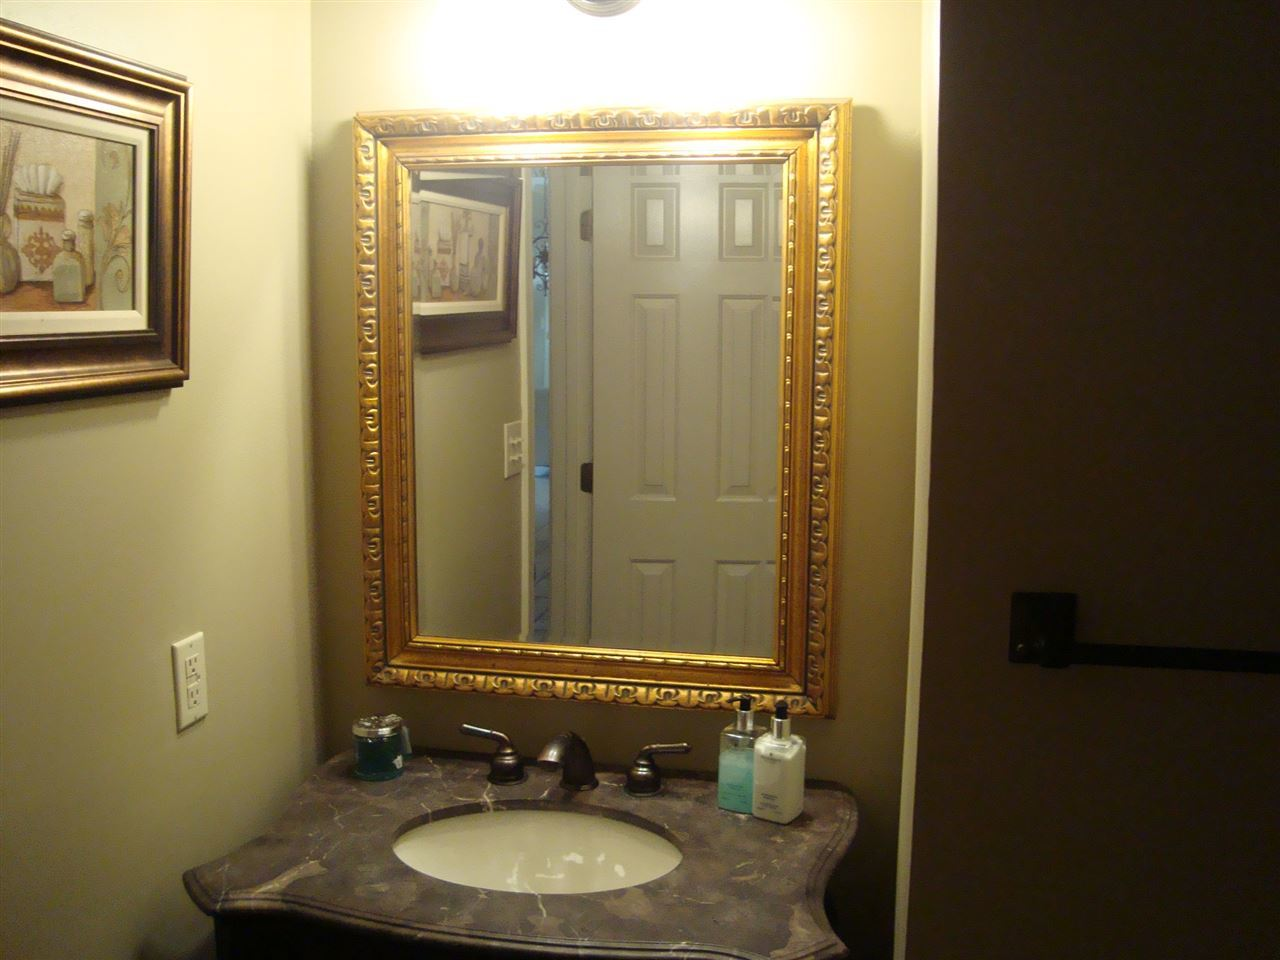 Bathroom Sinks Jackson Ms listing: 45 moss forest cir, jackson, ms.  mls# 295723   summer